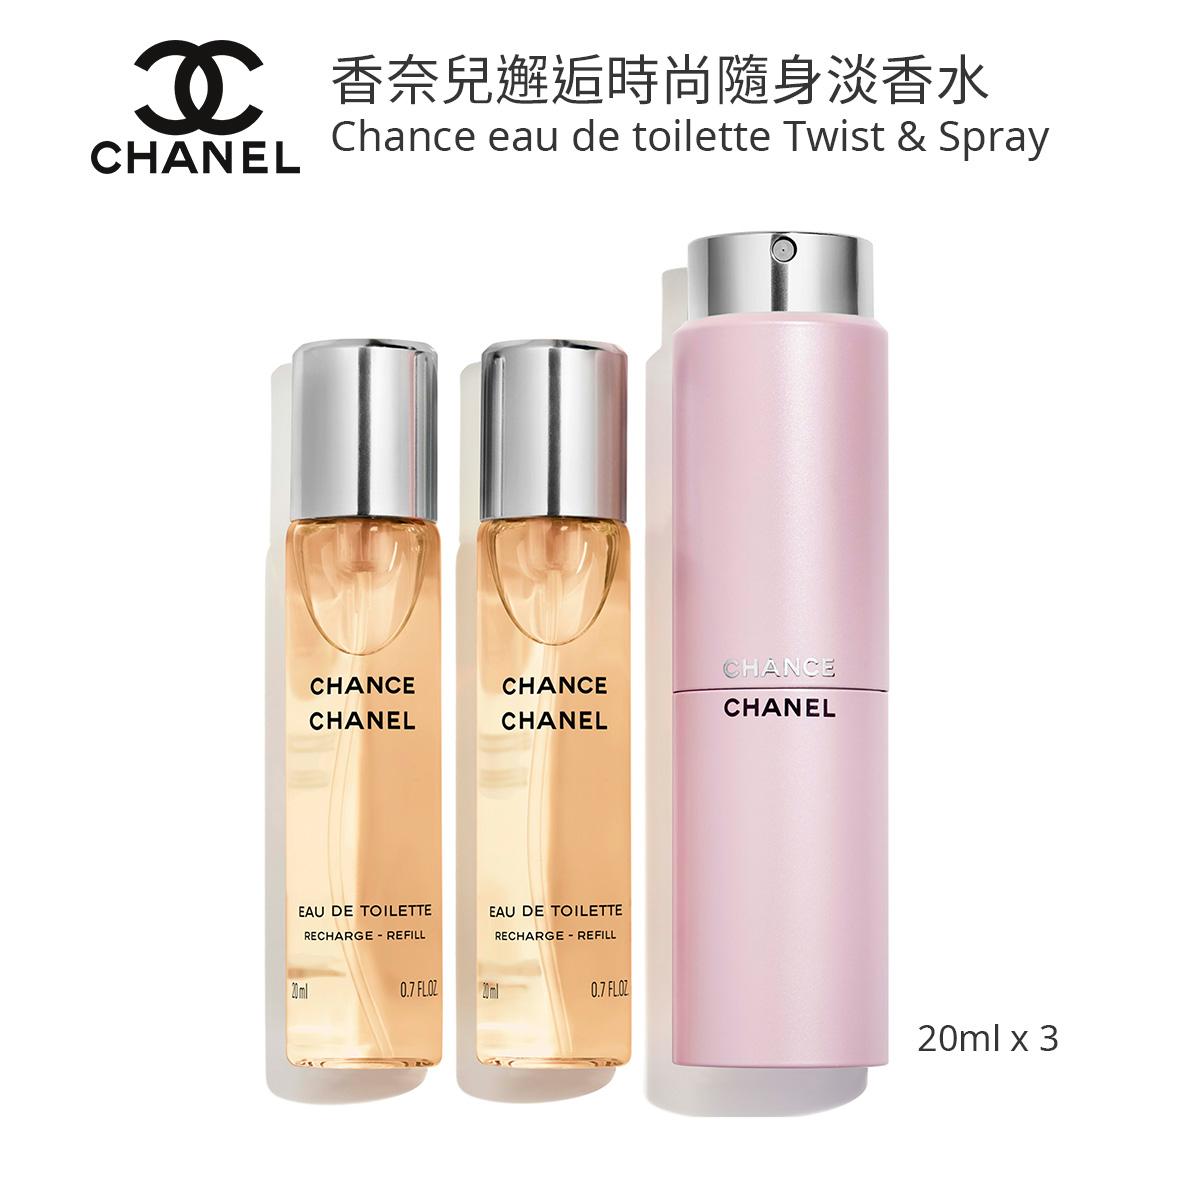 CHANEL 香奈兒 CHANCE 邂逅時尚隨身淡香水 20ml x3 (附補充瓶x2)